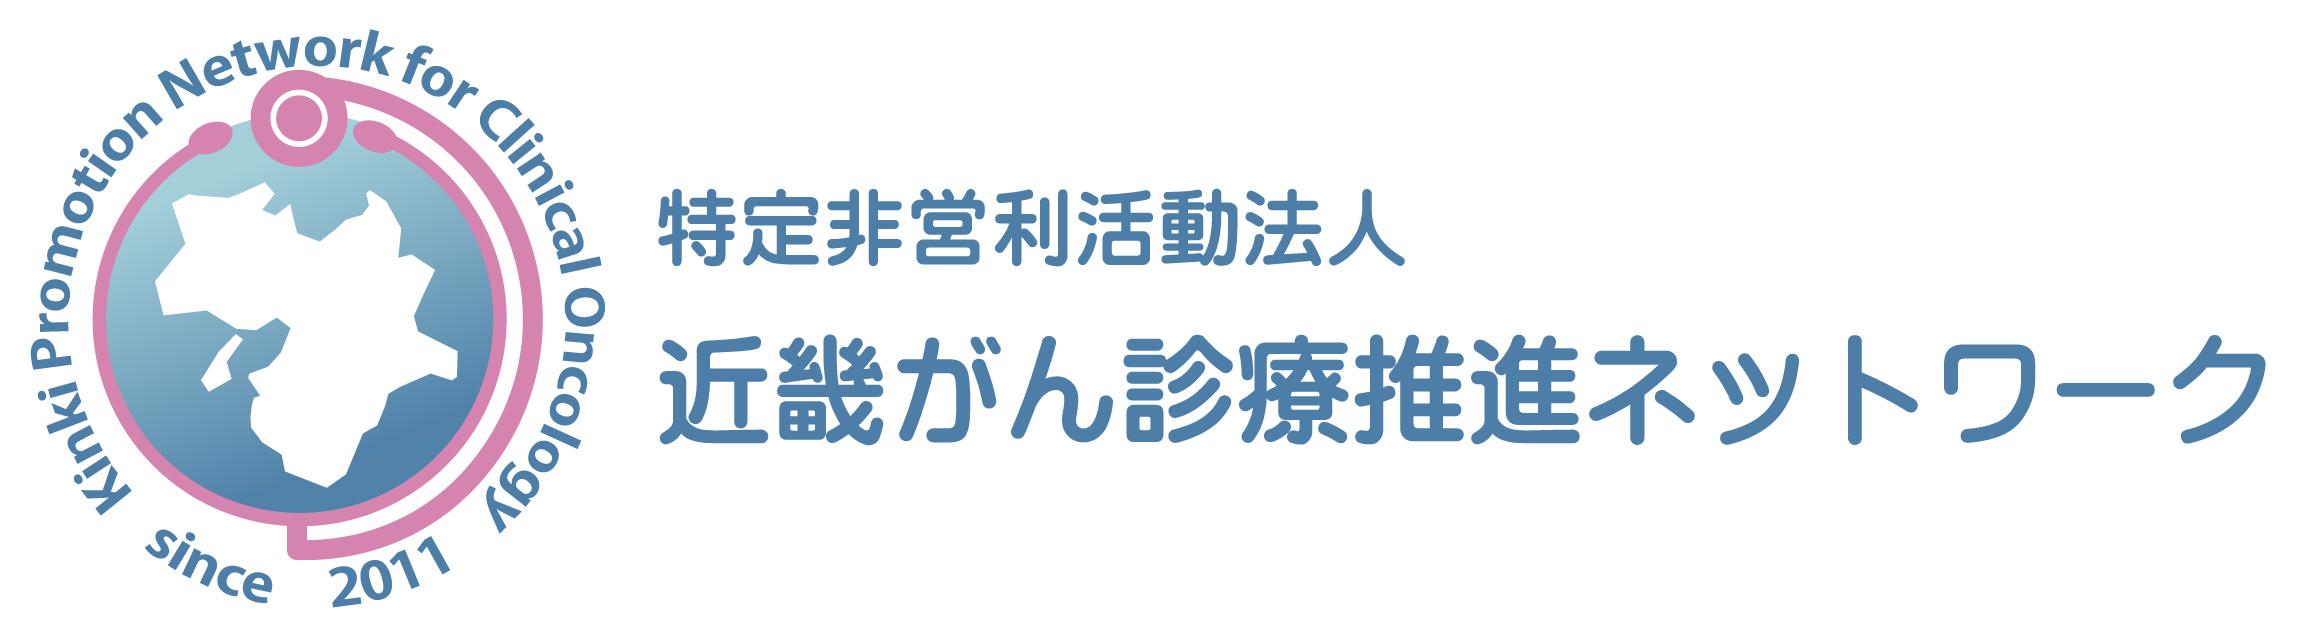 web用ロゴ